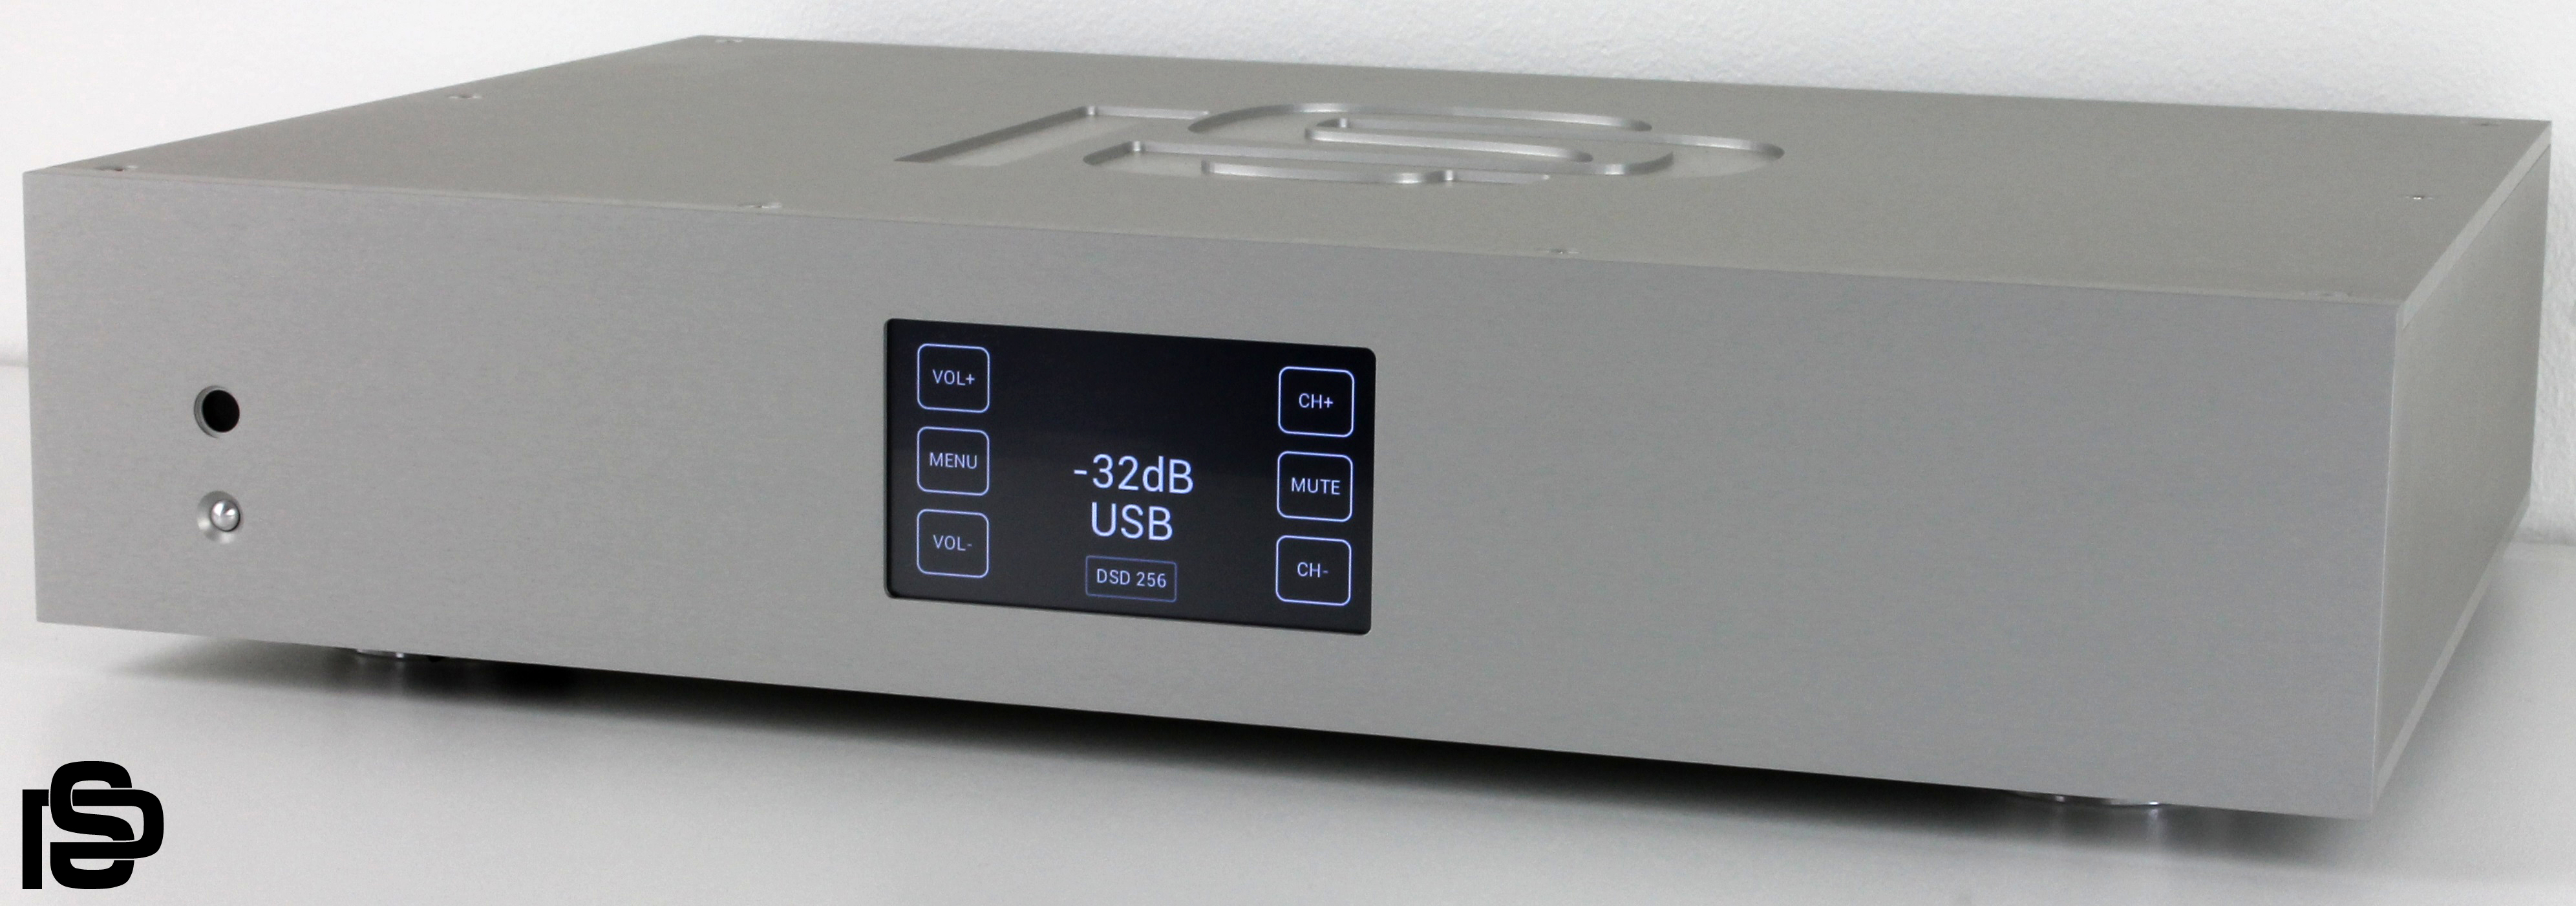 Phison Audio PD2 DAC / Vorstufe